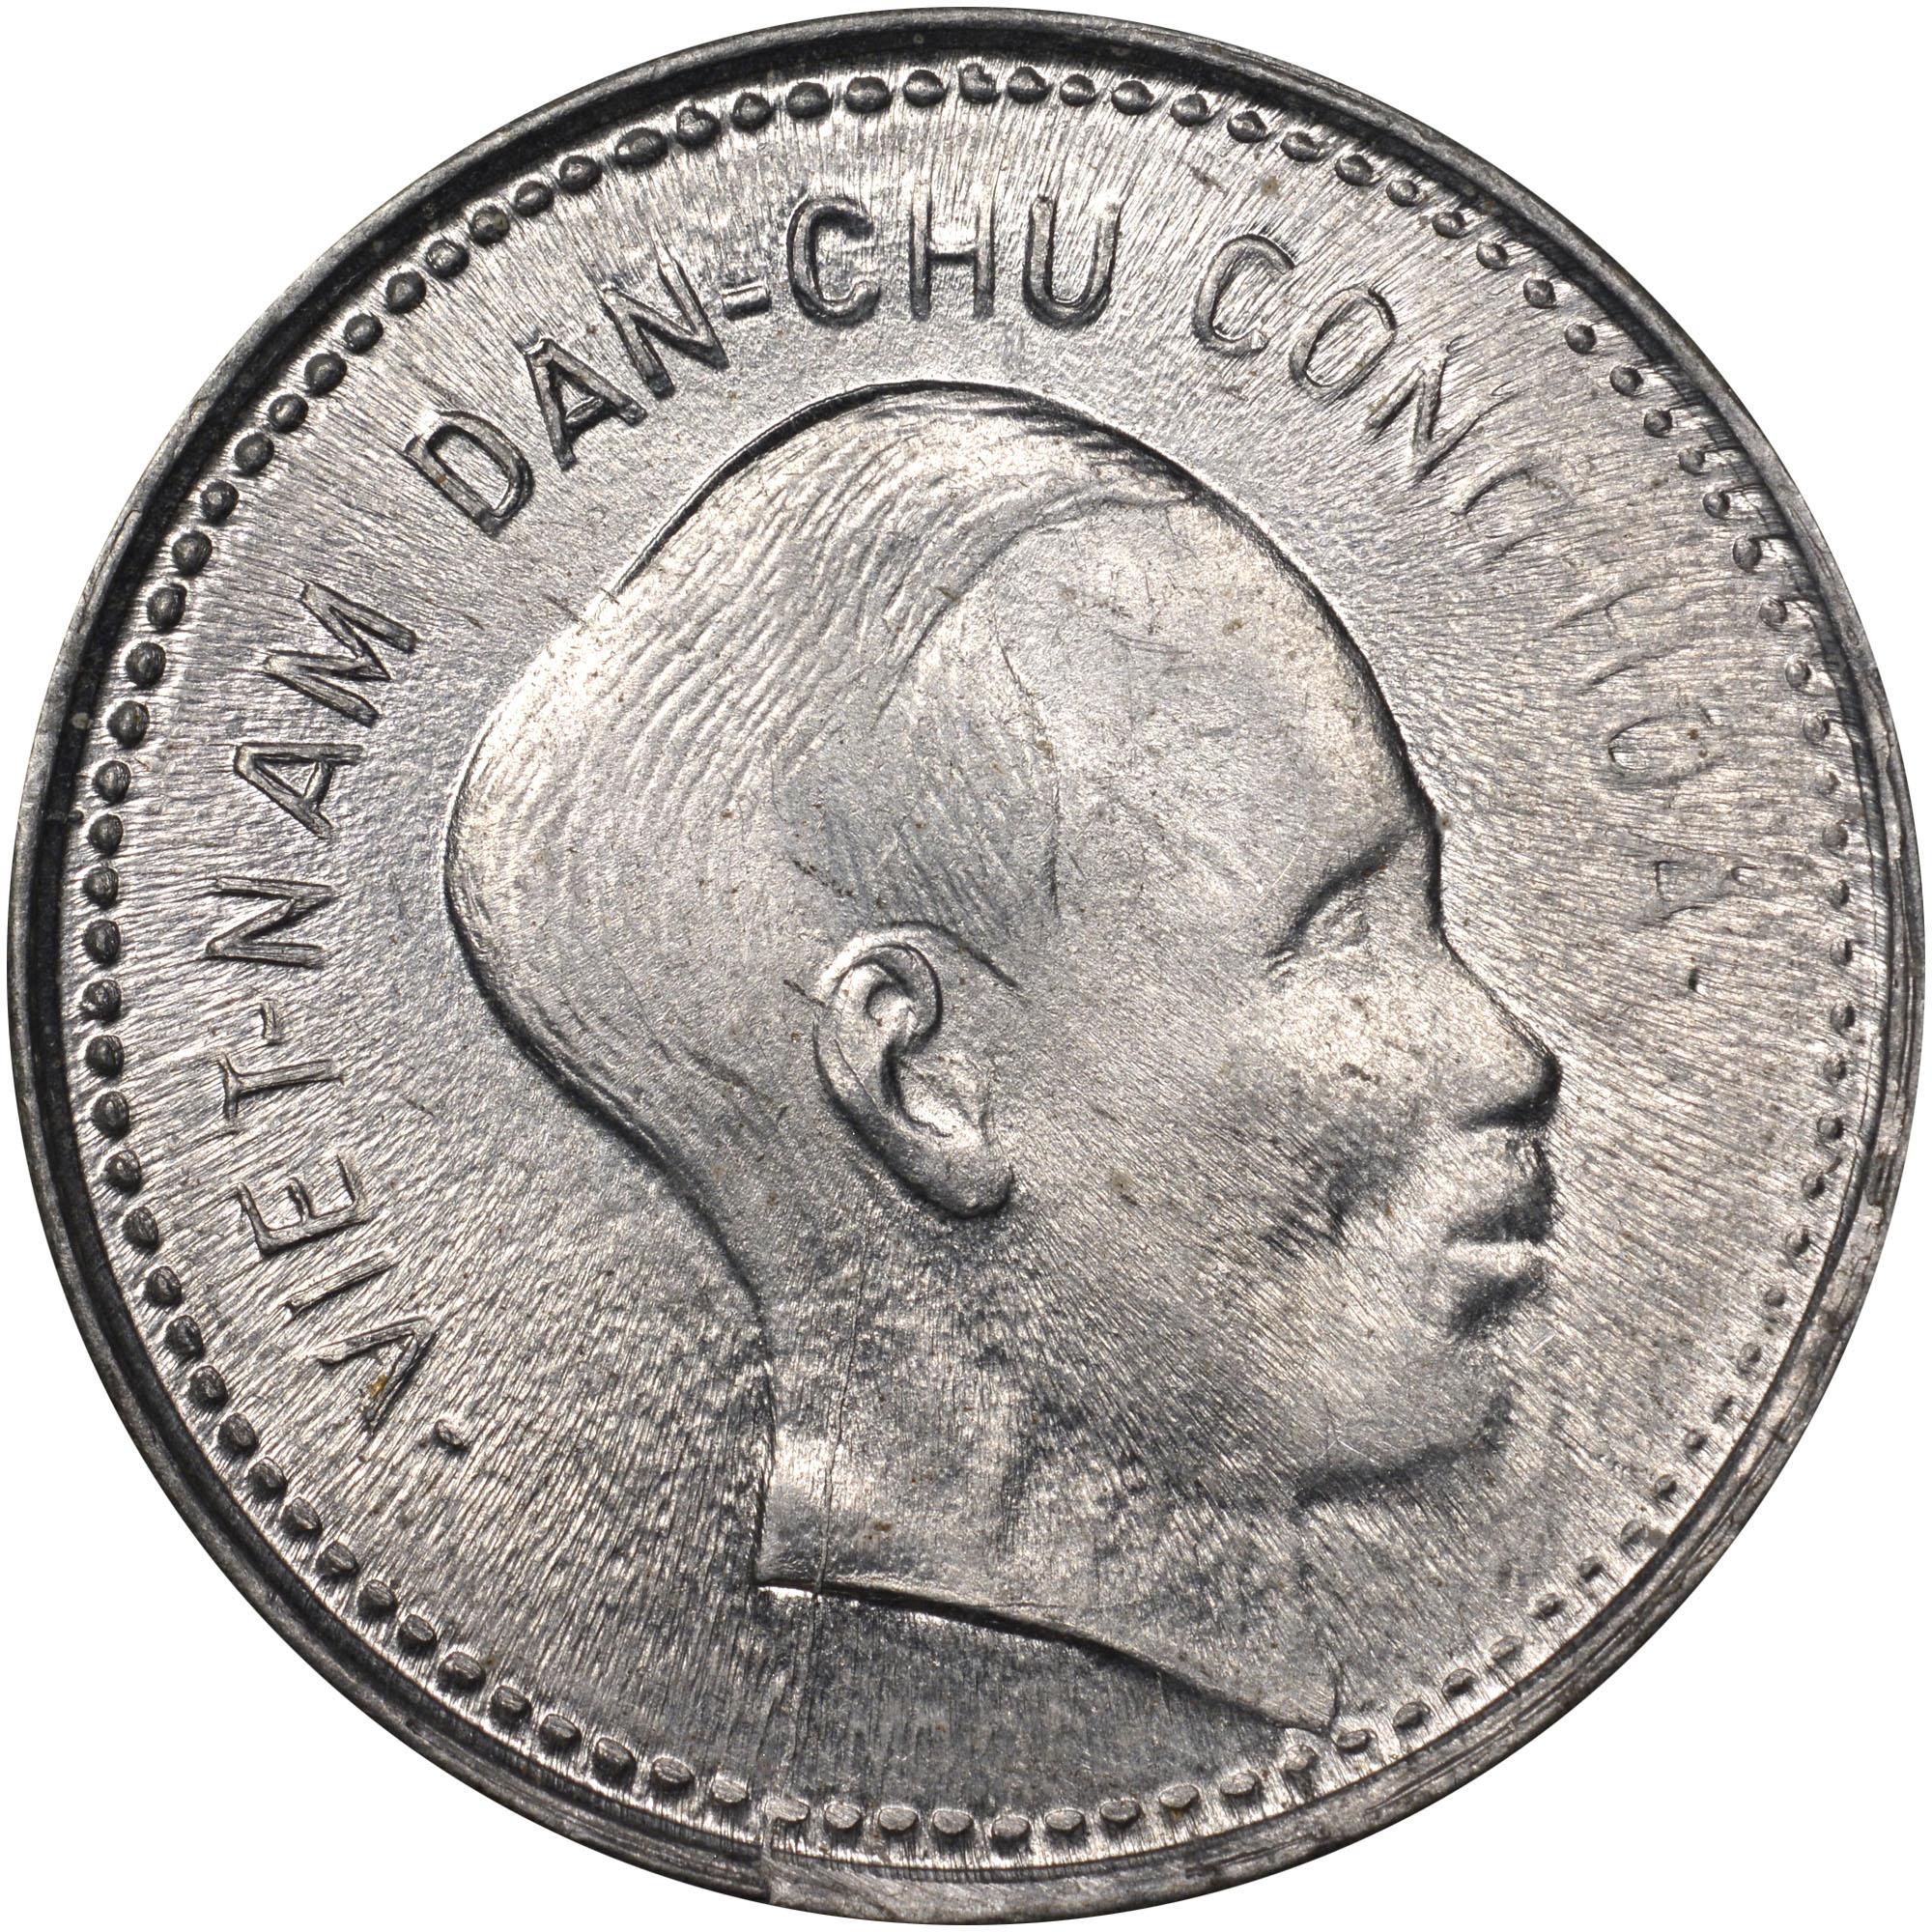 Viet Nam Dong obverse